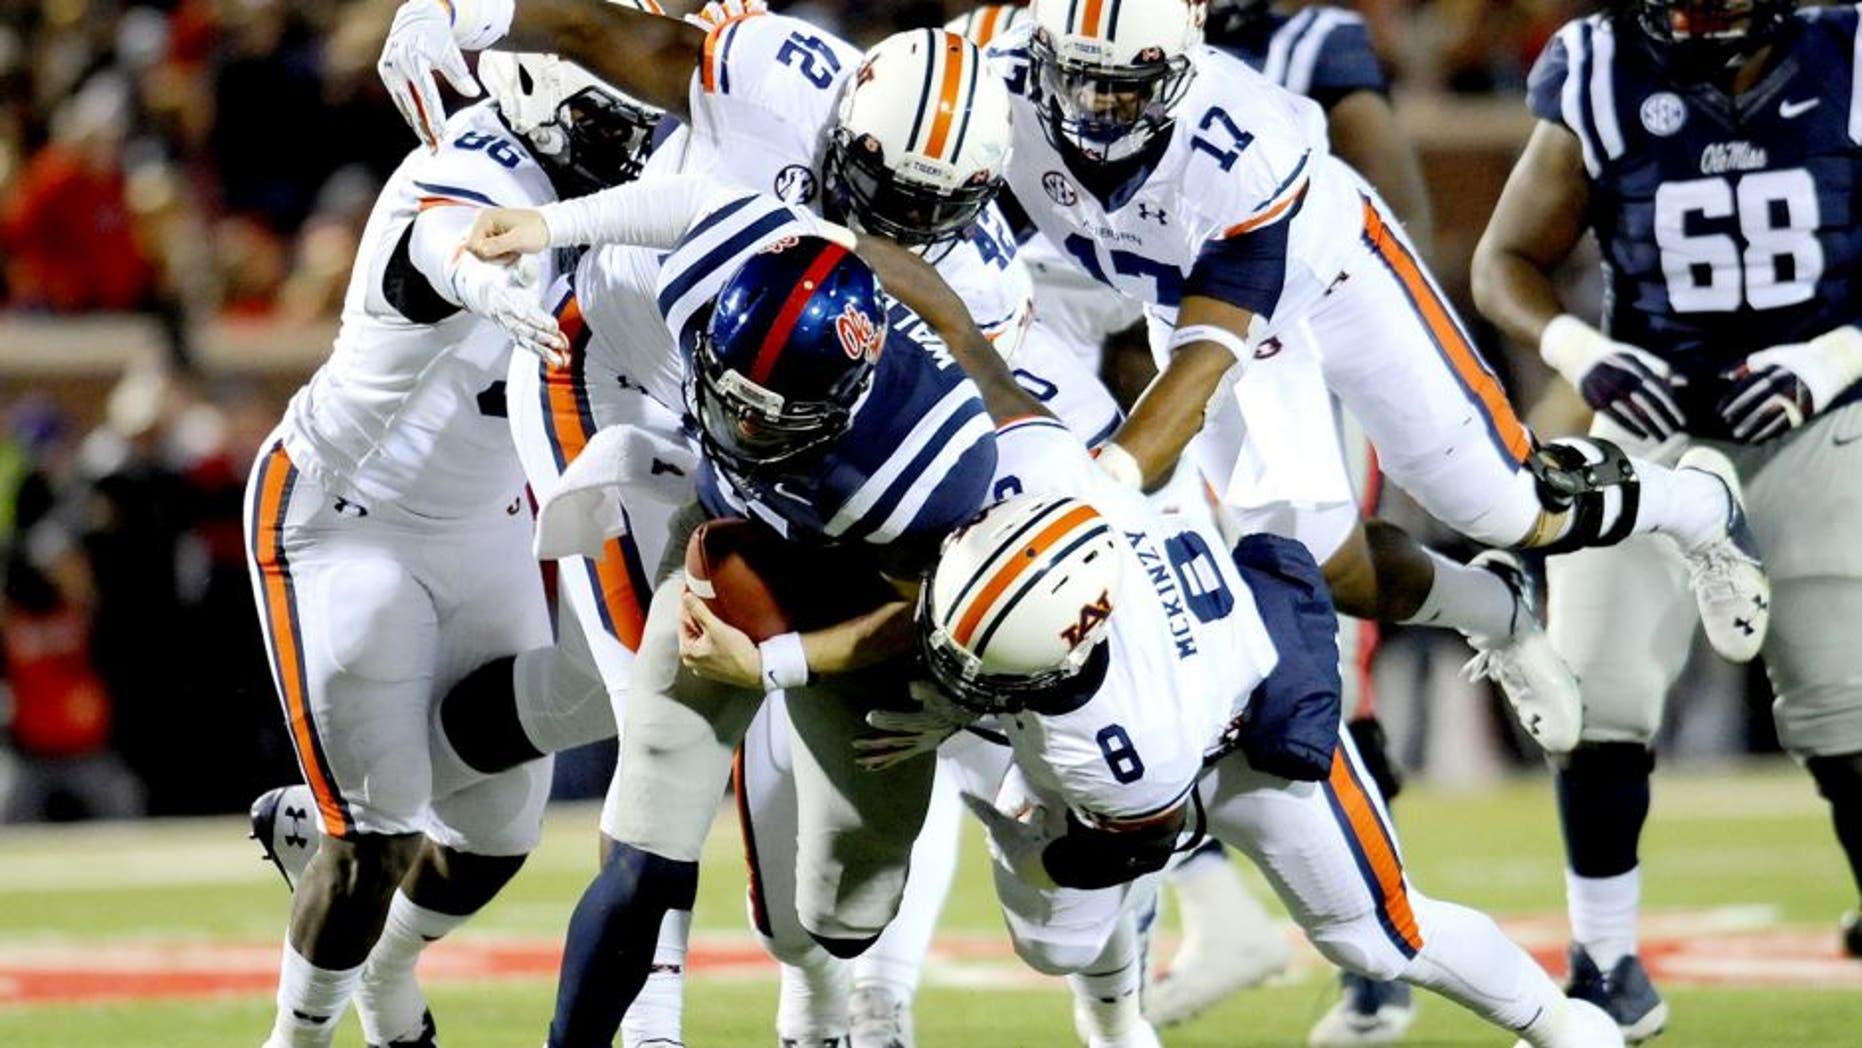 Nov 1, 2014; Oxford, MS, USA; Ole Miss Rebels quarterback Bo Wallace (14) is tackled by Auburn Tigers linebacker Cassanova McKinzy (8) during the second quarter at Vaught-Hemingway Stadium. Mandatory Credit: Shanna Lockwood-USA TODAY Sports